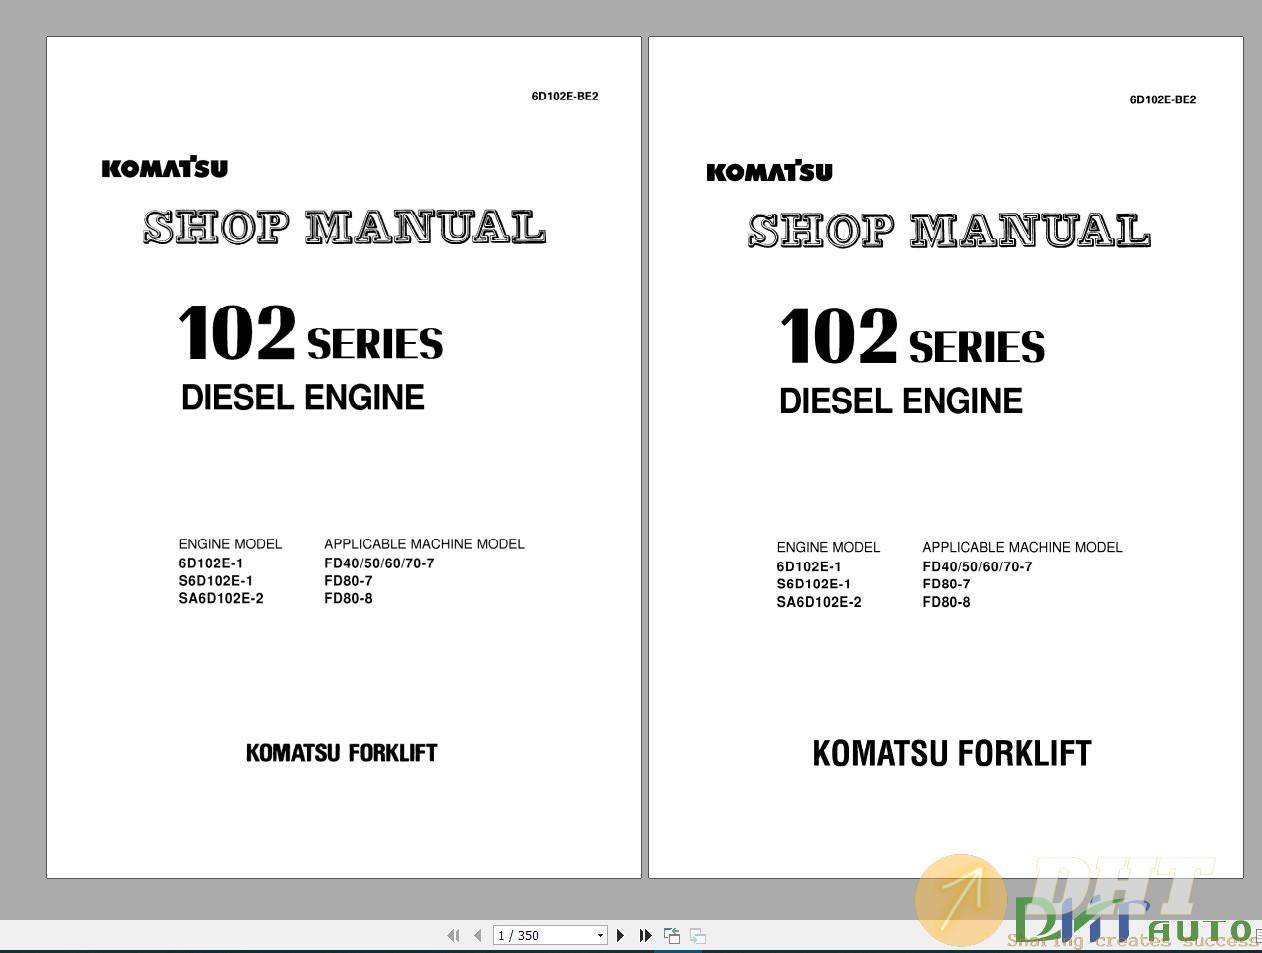 Komatsu-Forklift-Shop-Manual-PDF-Full-2.jpg